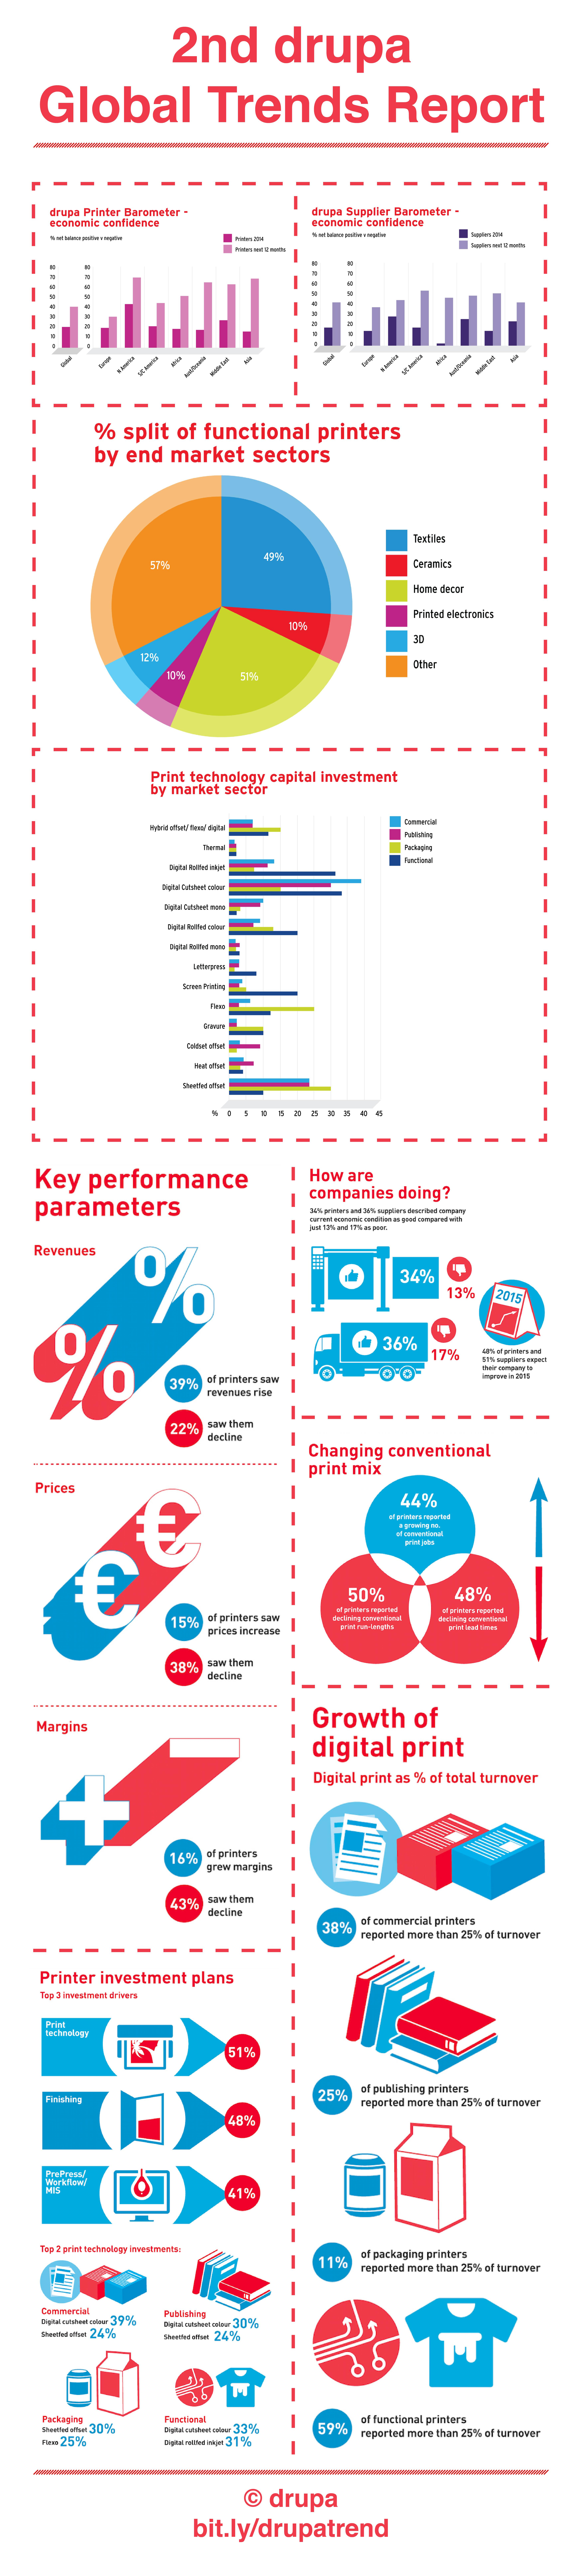 drupa-infographic